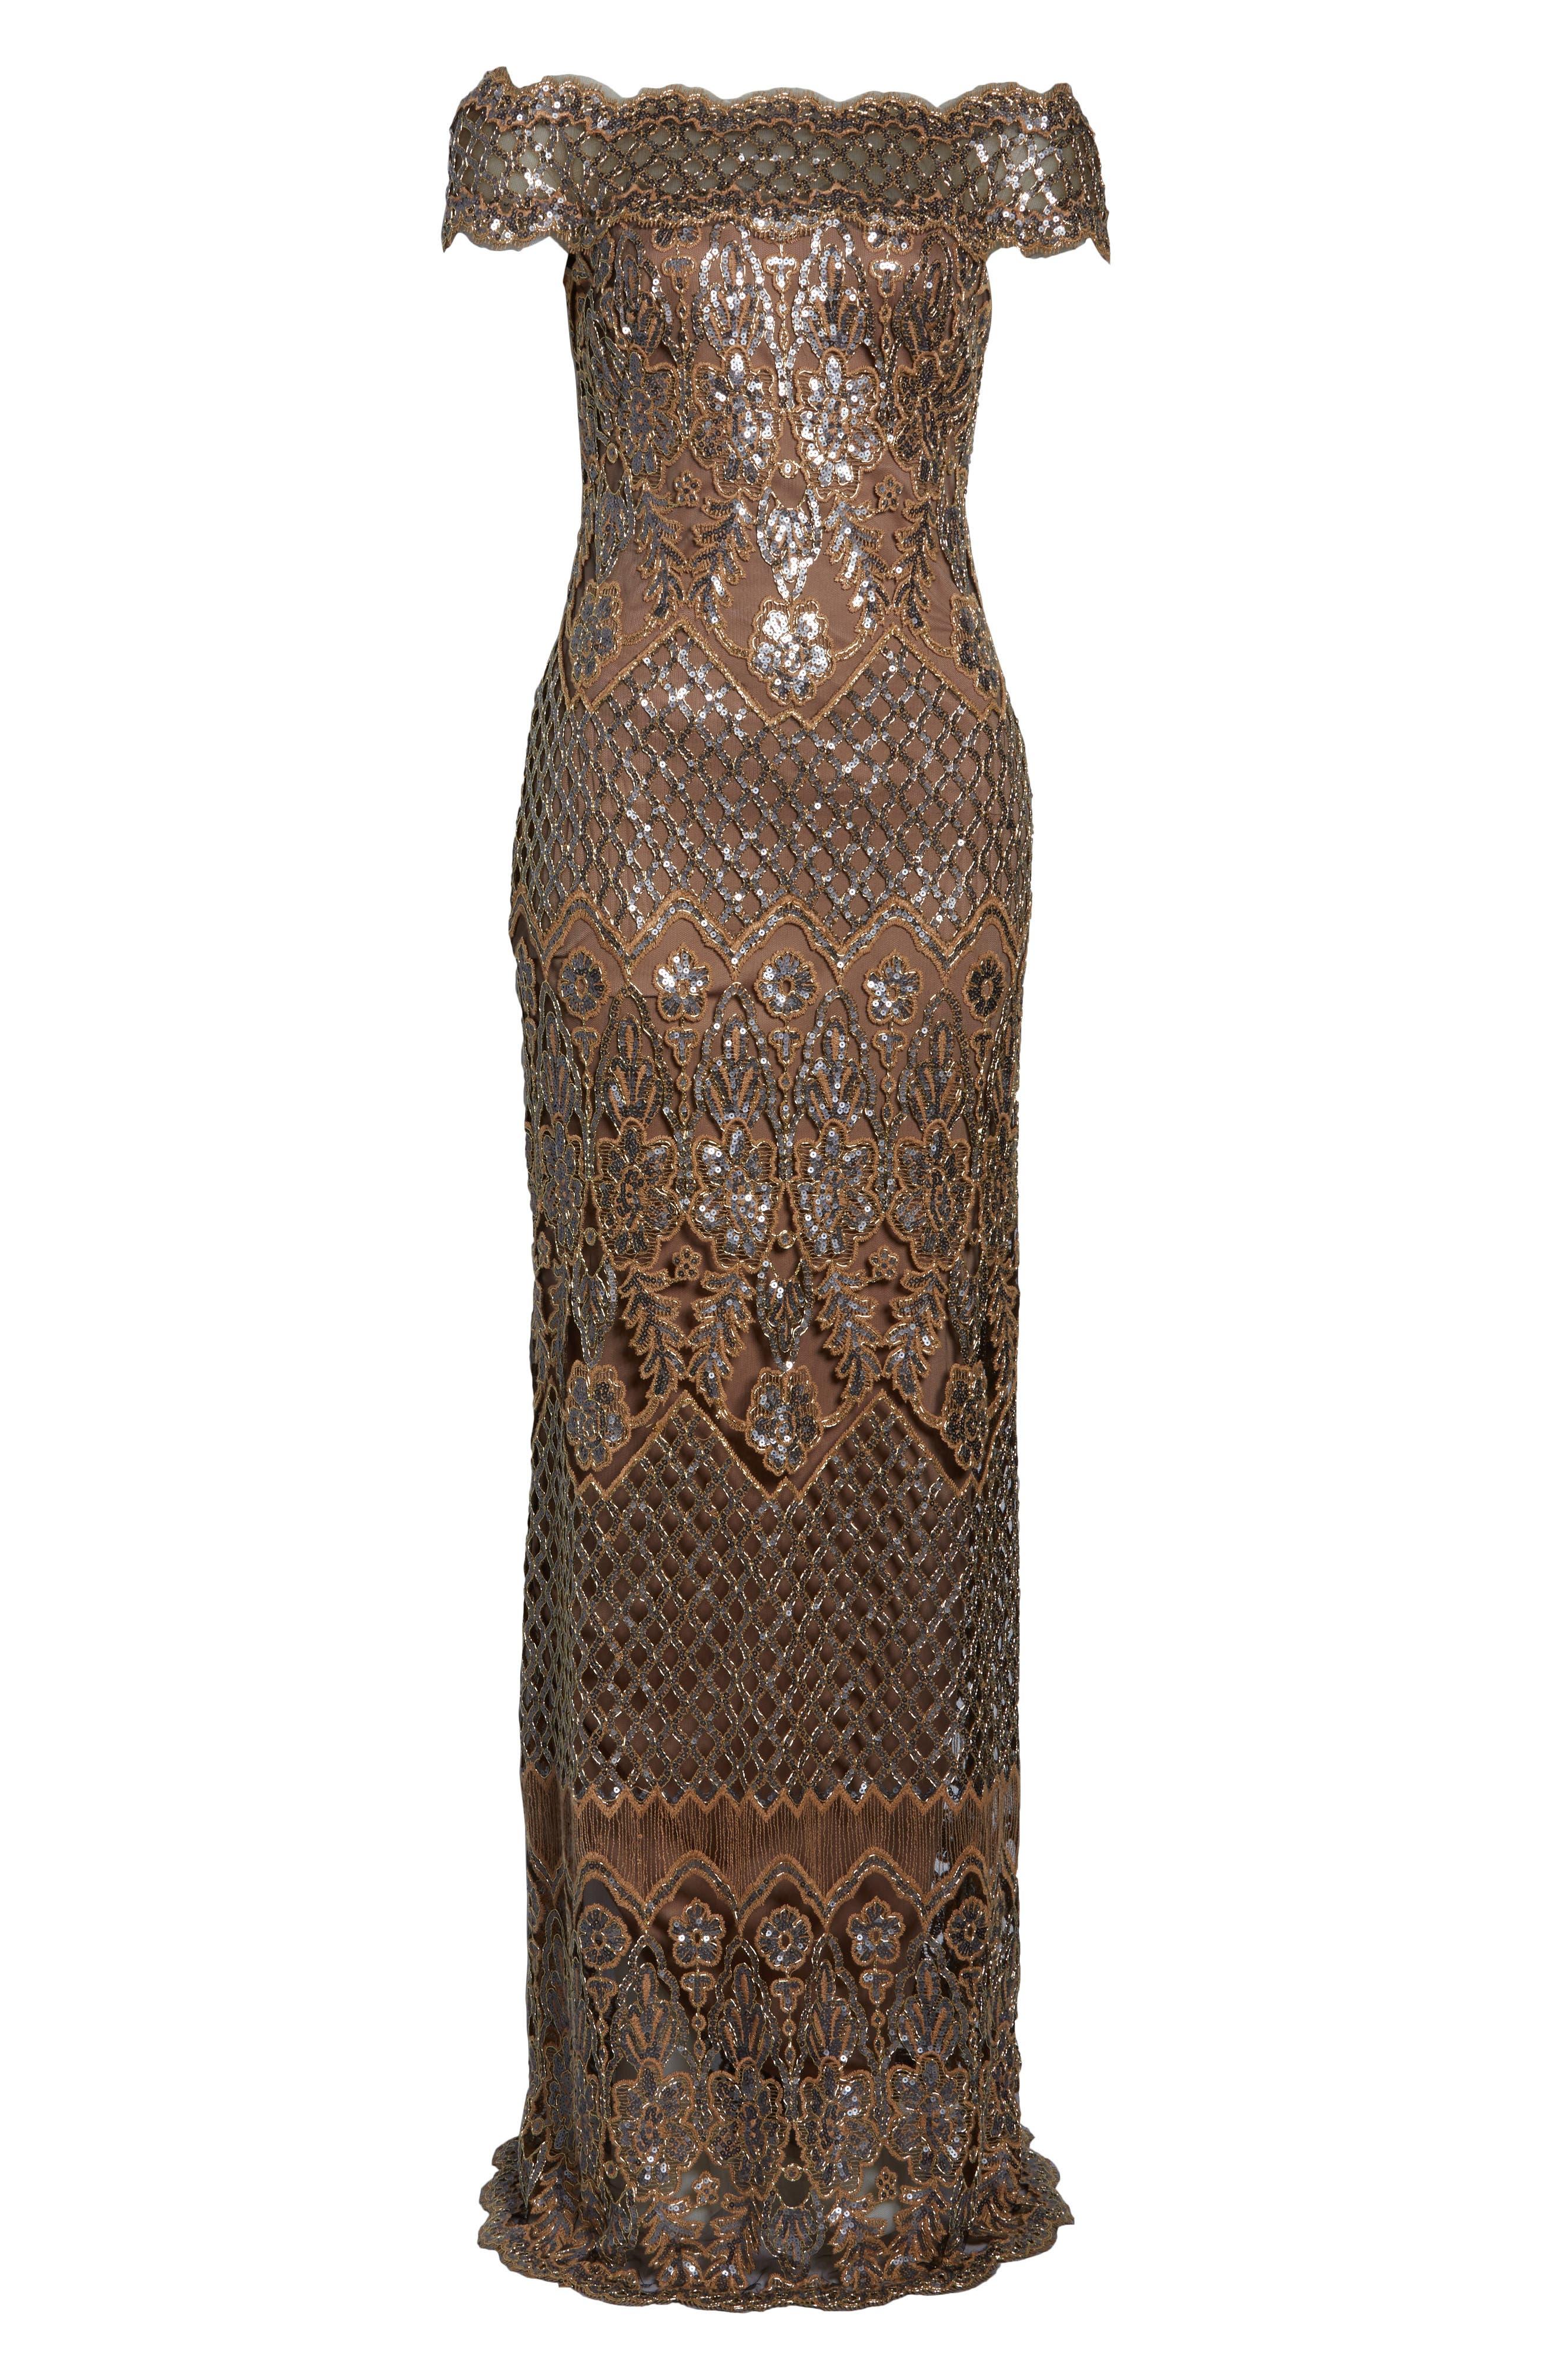 TADASHI SHOJI, Illusion Neck Sequin Lace Evening Dress, Alternate thumbnail 7, color, 230